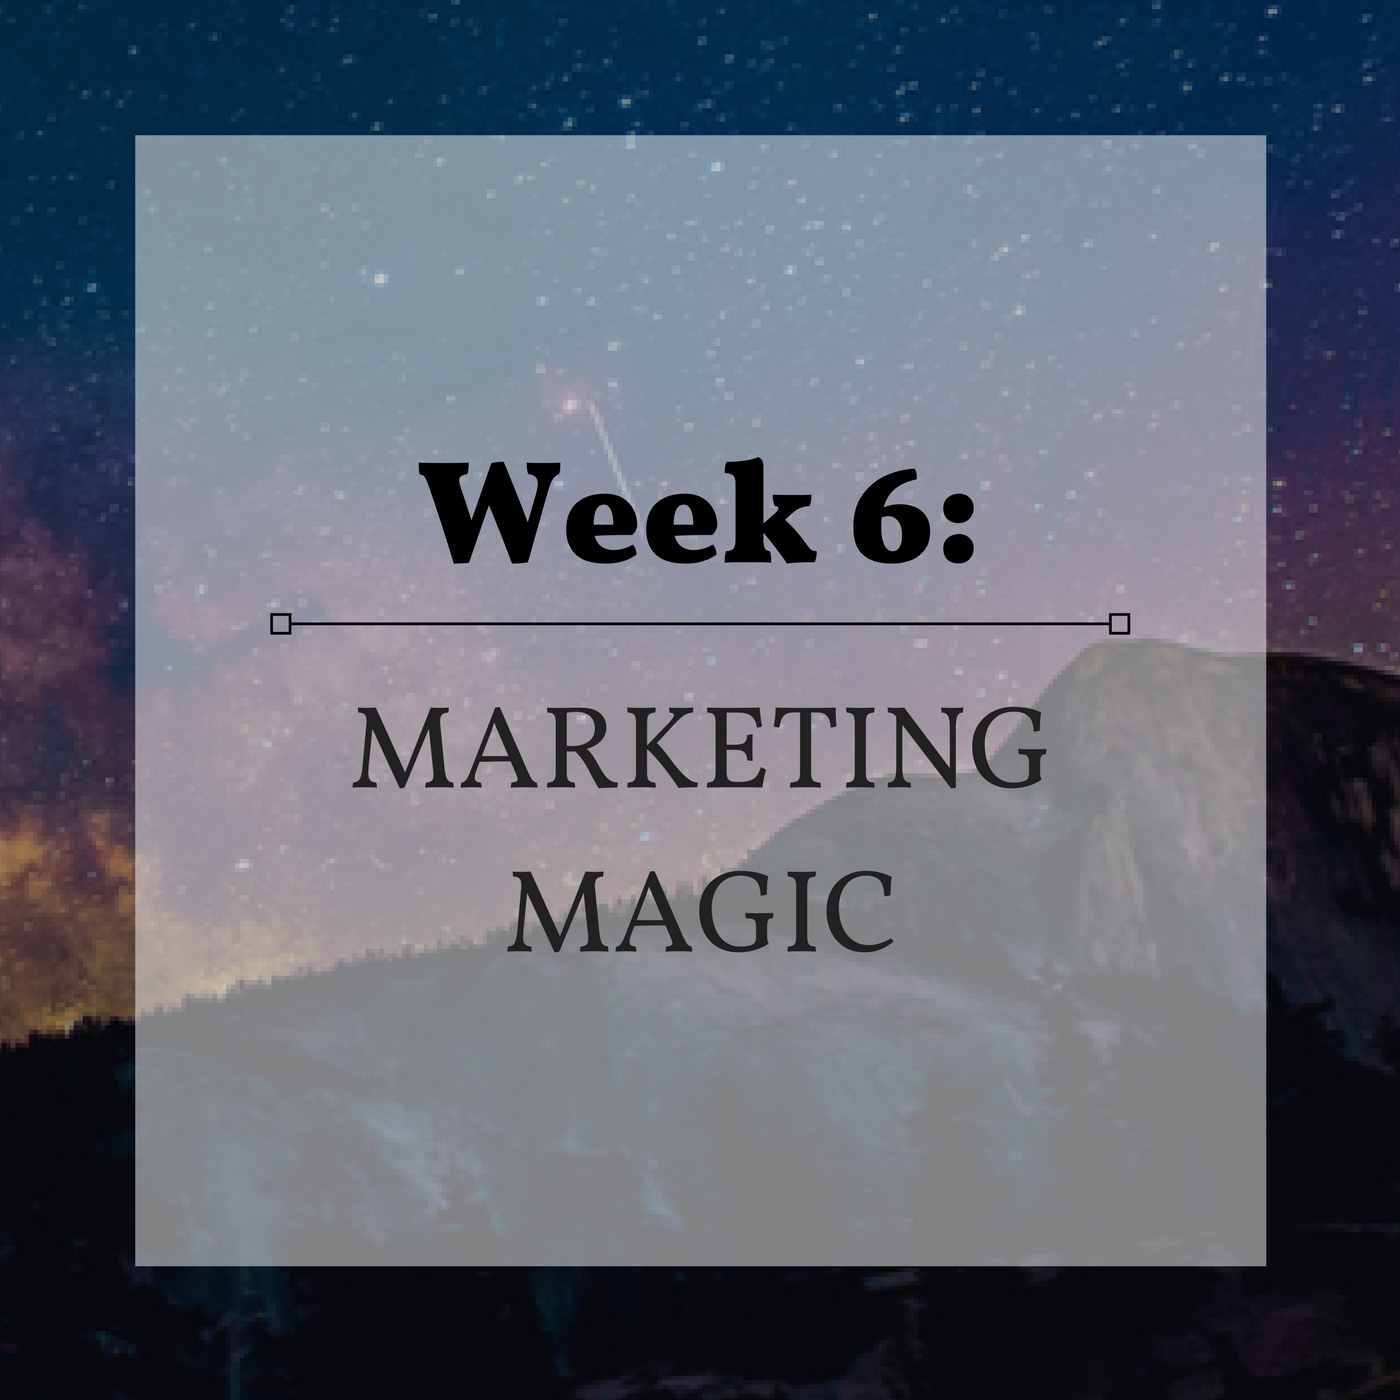 Week 6 Marketing Magic